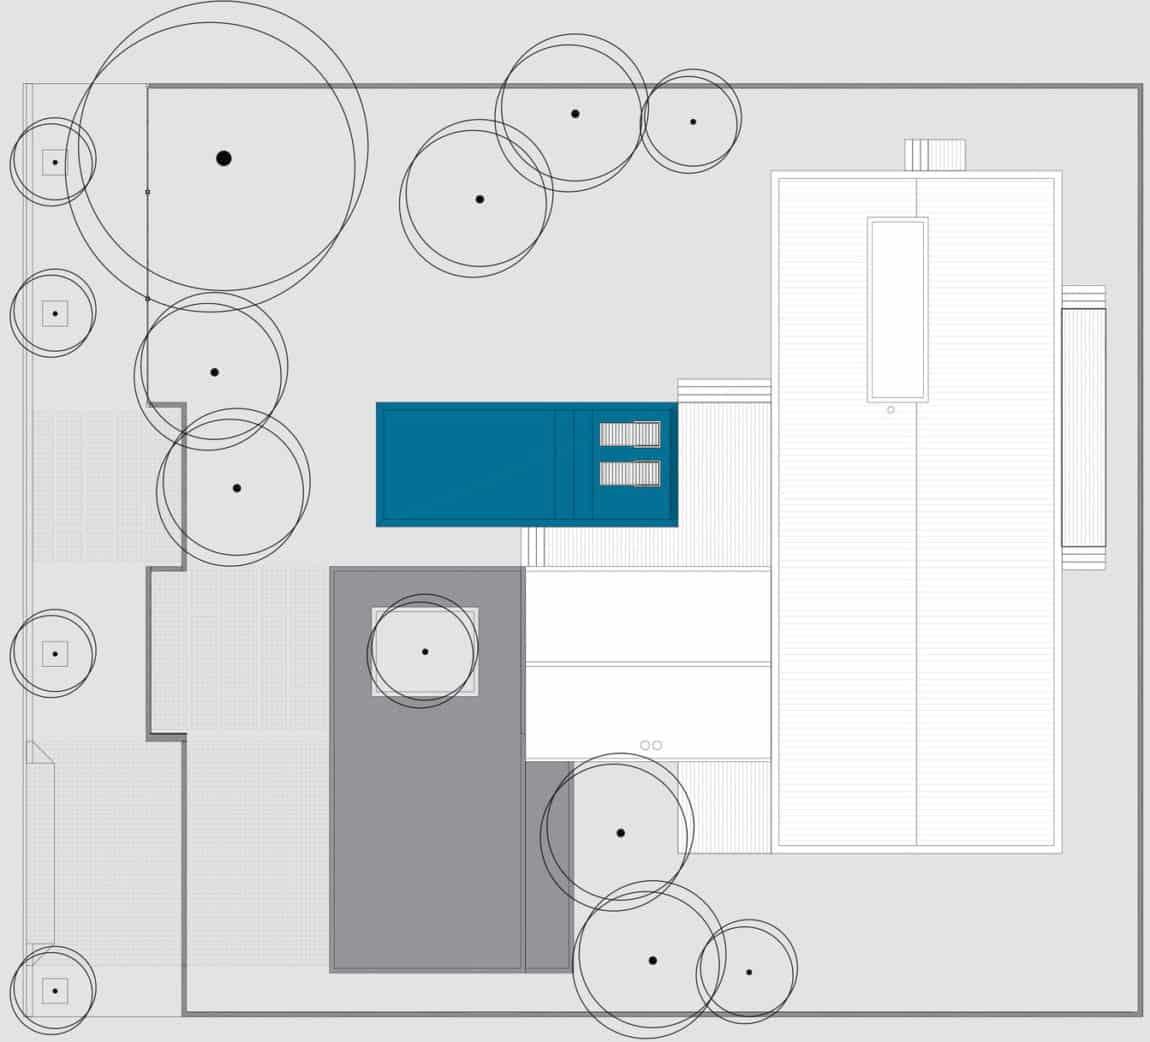 Casa Laranjal by Rmk! Arquitetura (16)